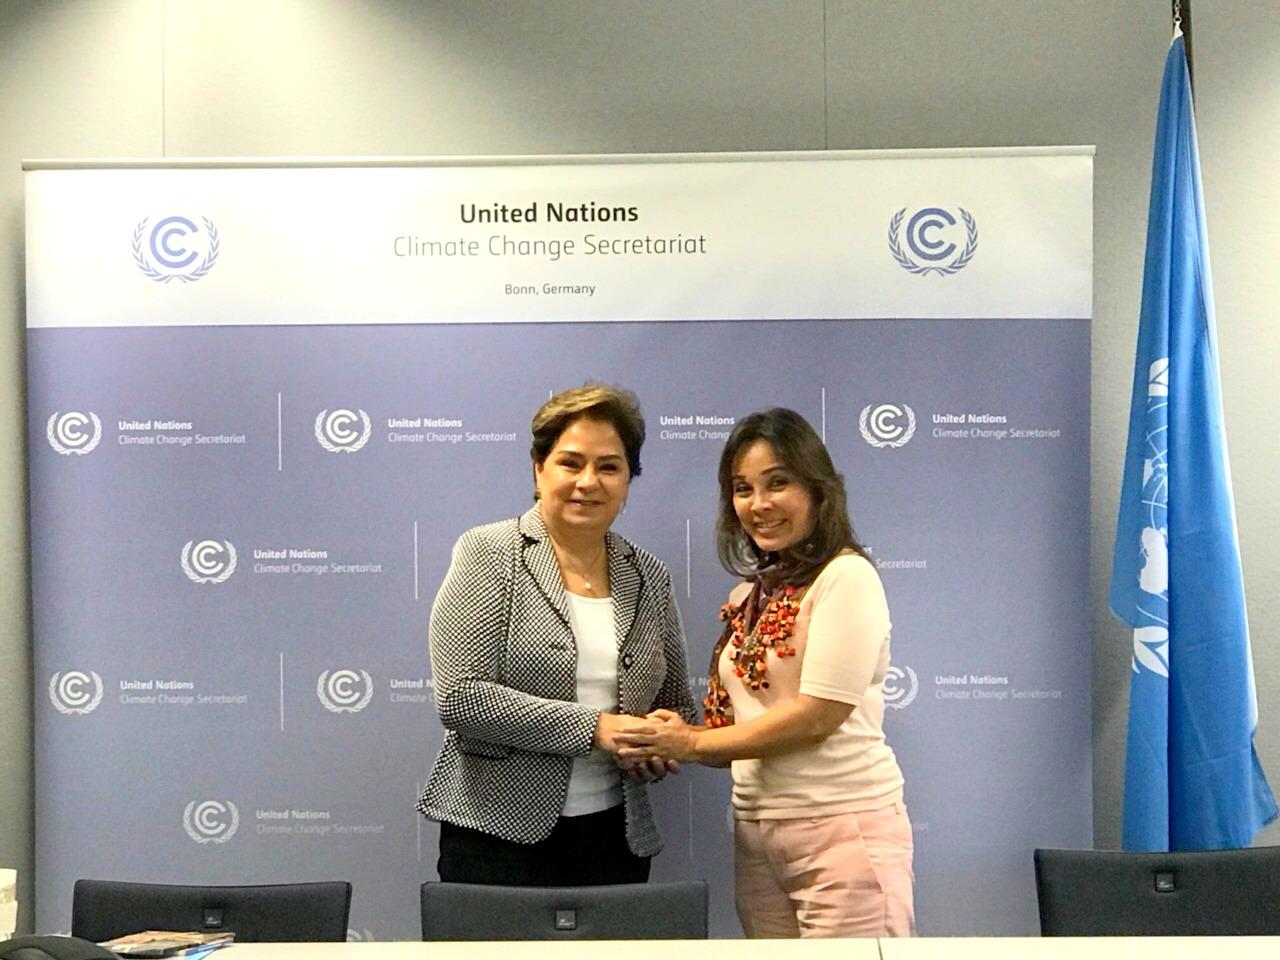 Senator Loren Legarda meets with Patricia Espinosa, Executive Secretary of the United Nations Framework Convention on Climate Change (UNFCCC)